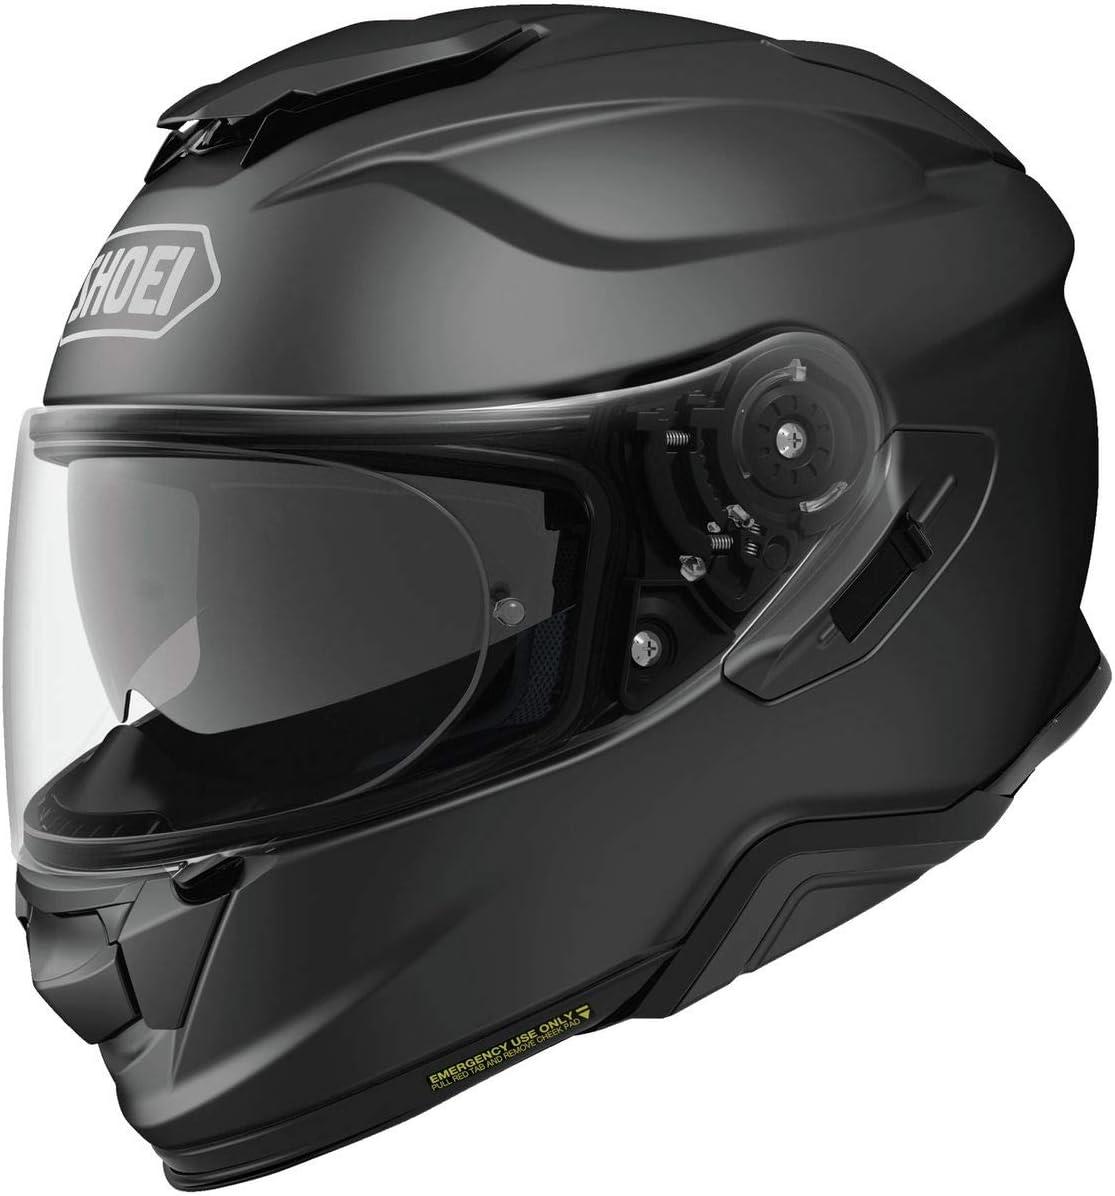 Shoei San Antonio Mall New products, world's highest quality popular! GT-Air II Helmet Large Matte Black